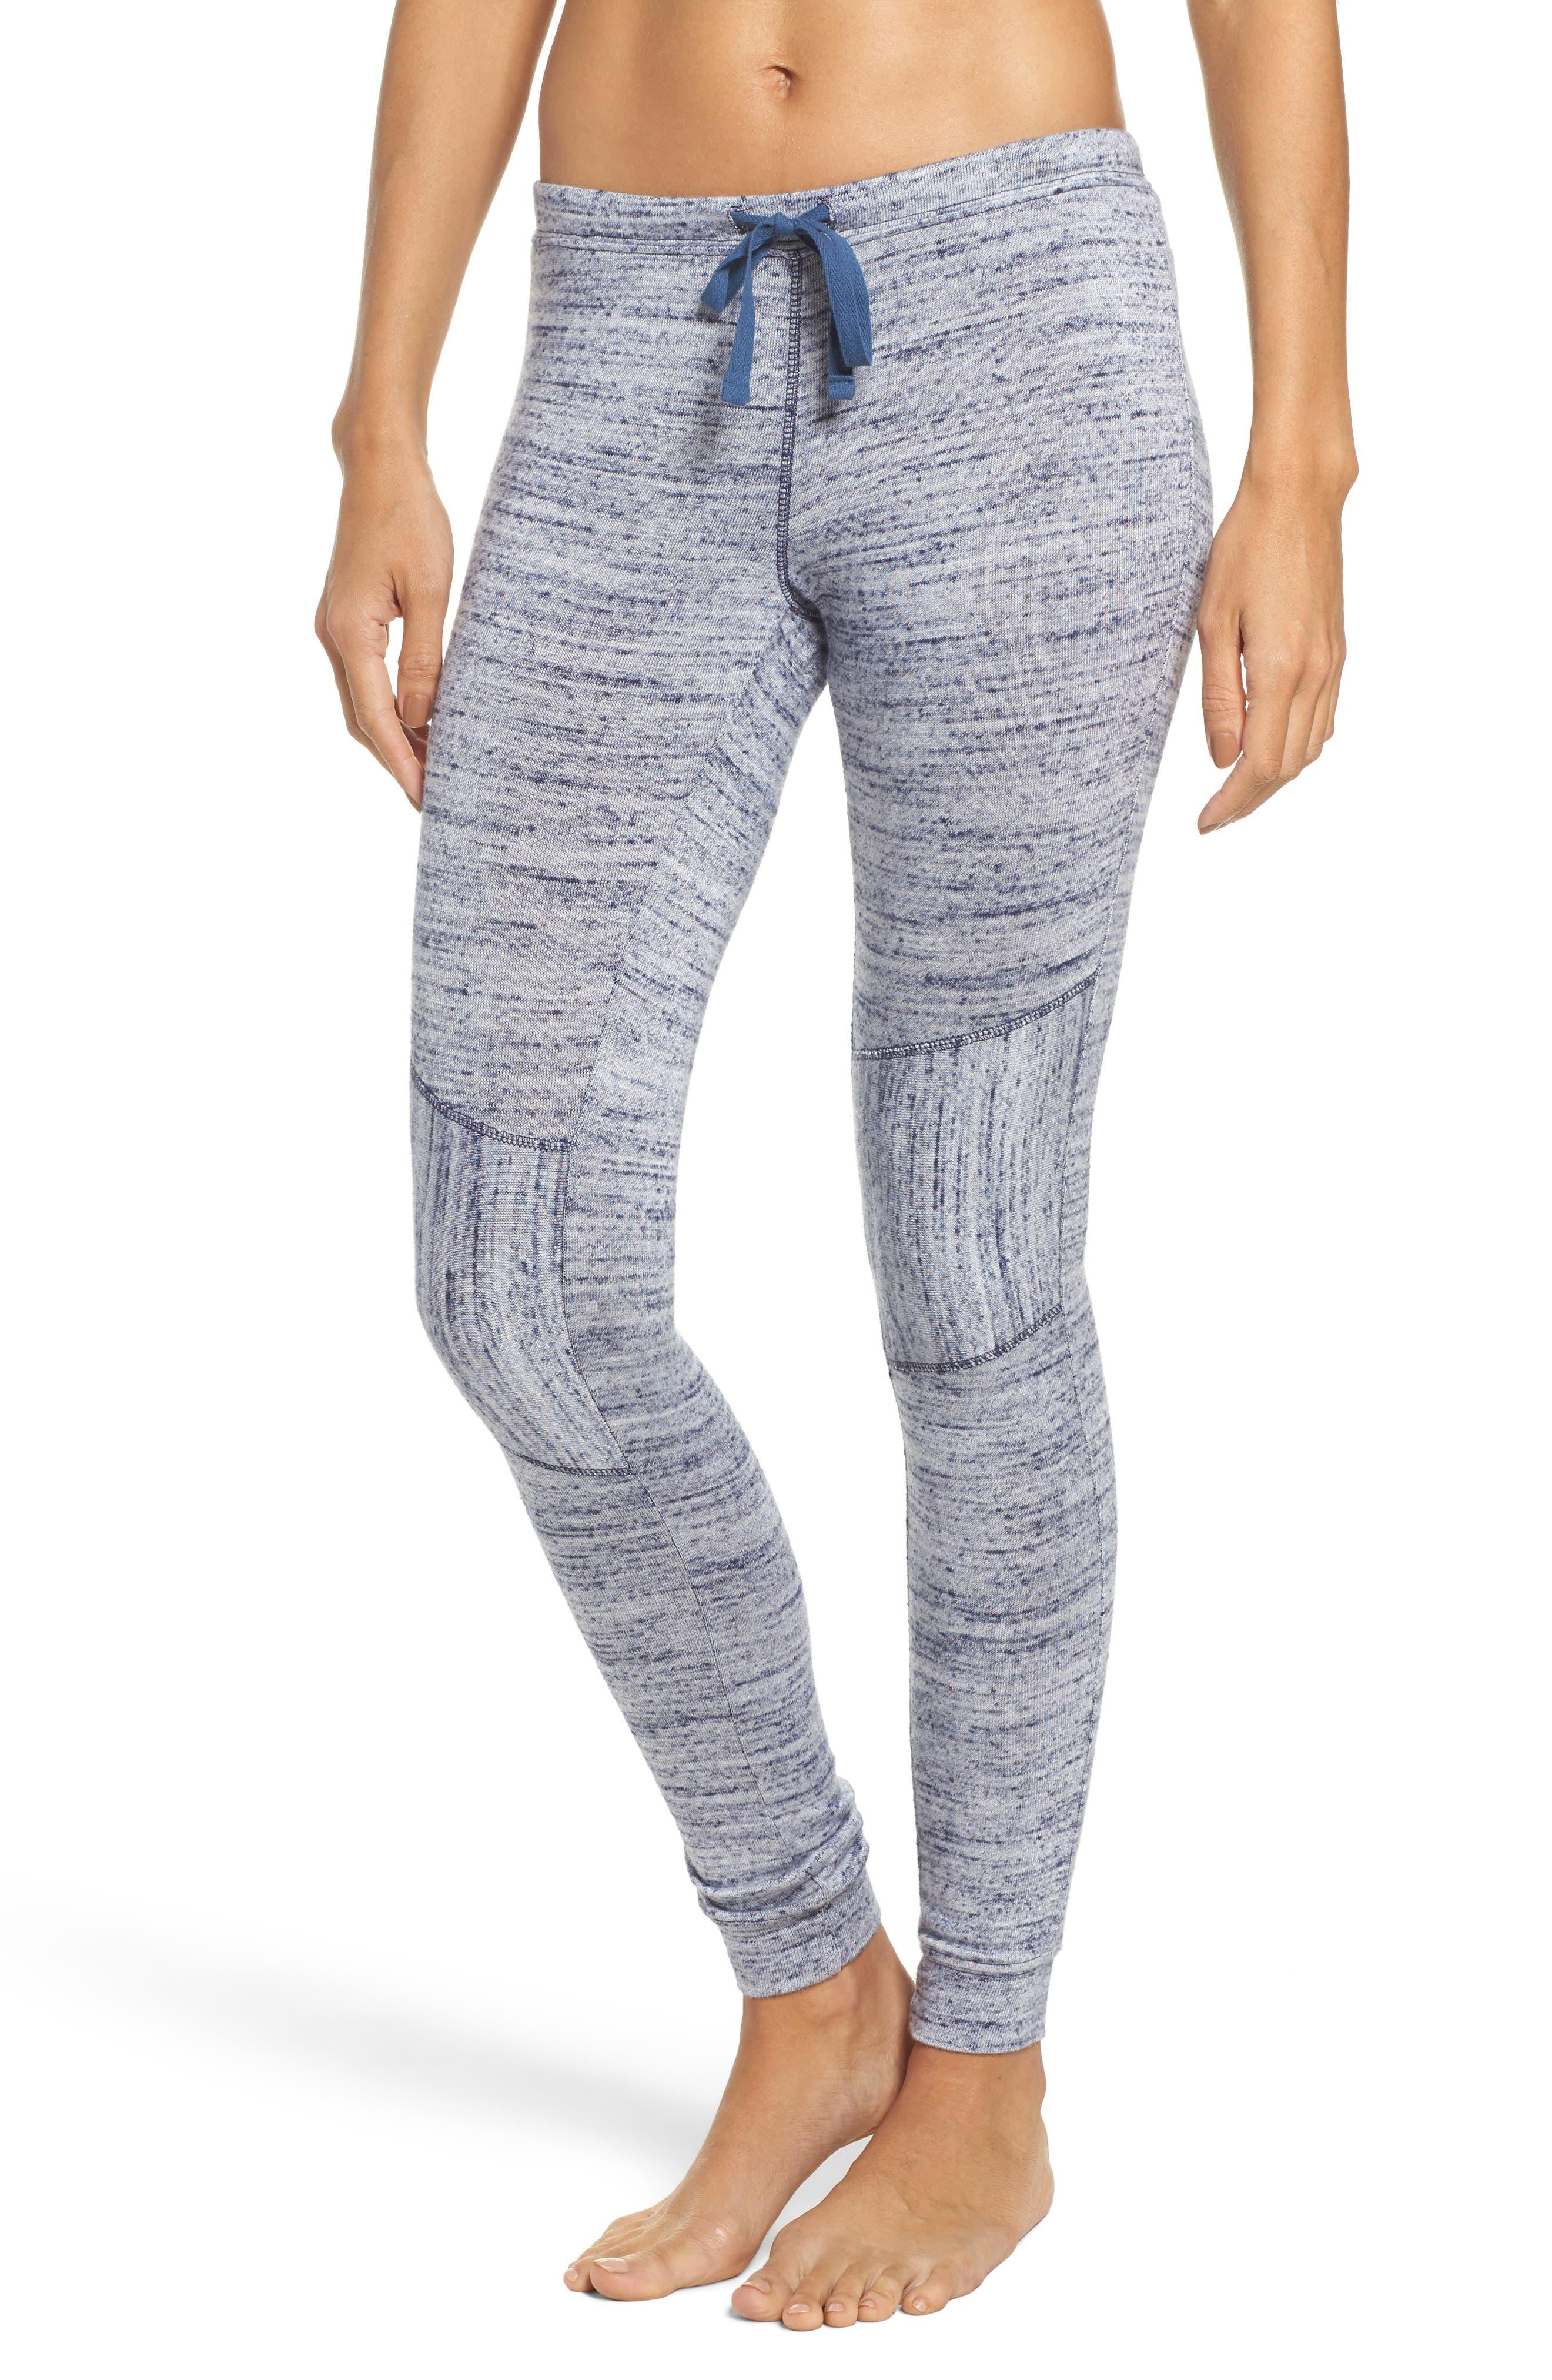 Harley Pants,                         Main,                         color, Blue